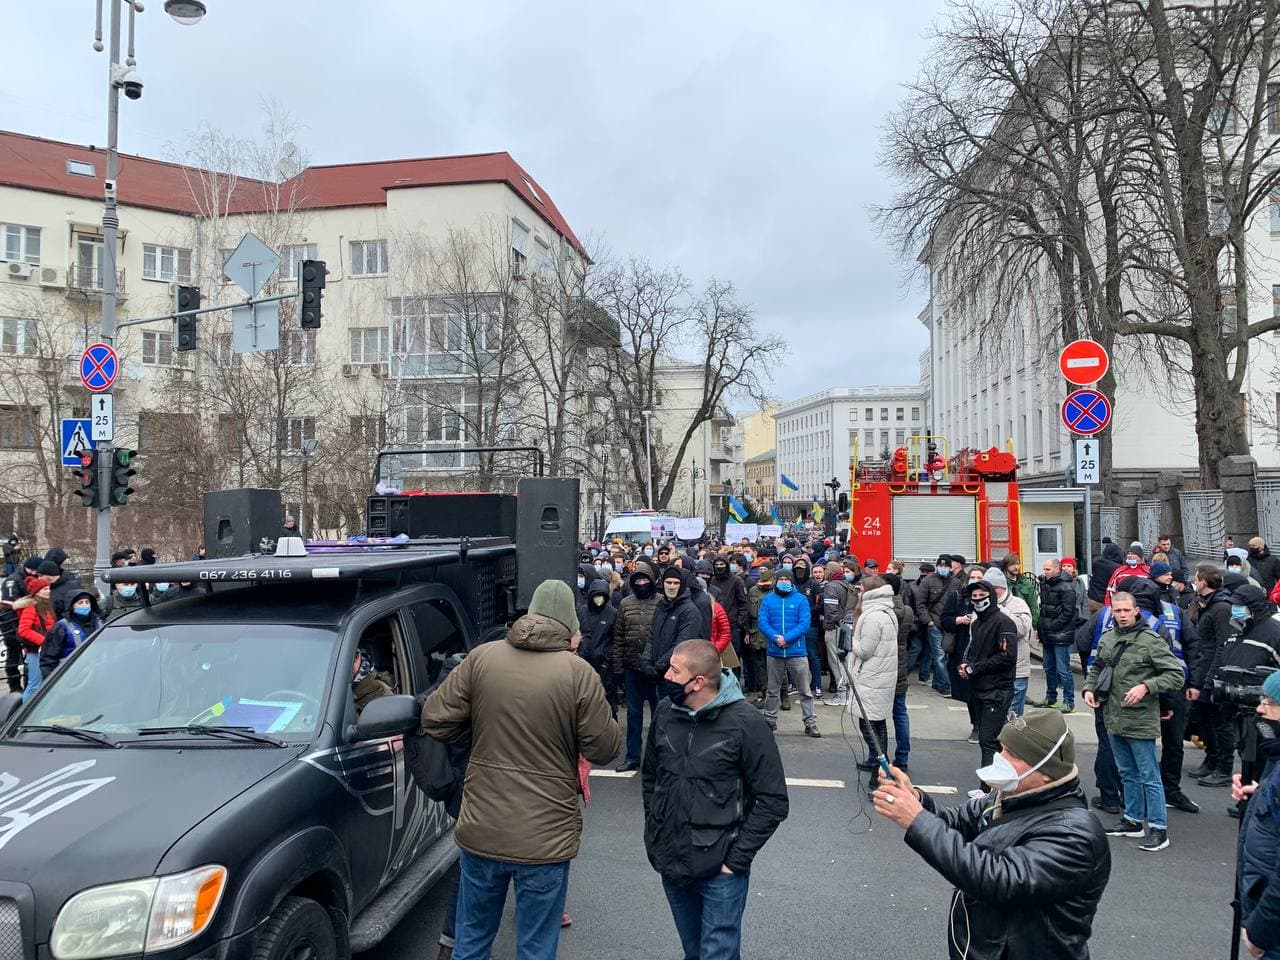 Приговор Стерненко. В центре Киева прошла акция протеста – трансляция, фоторепортаж